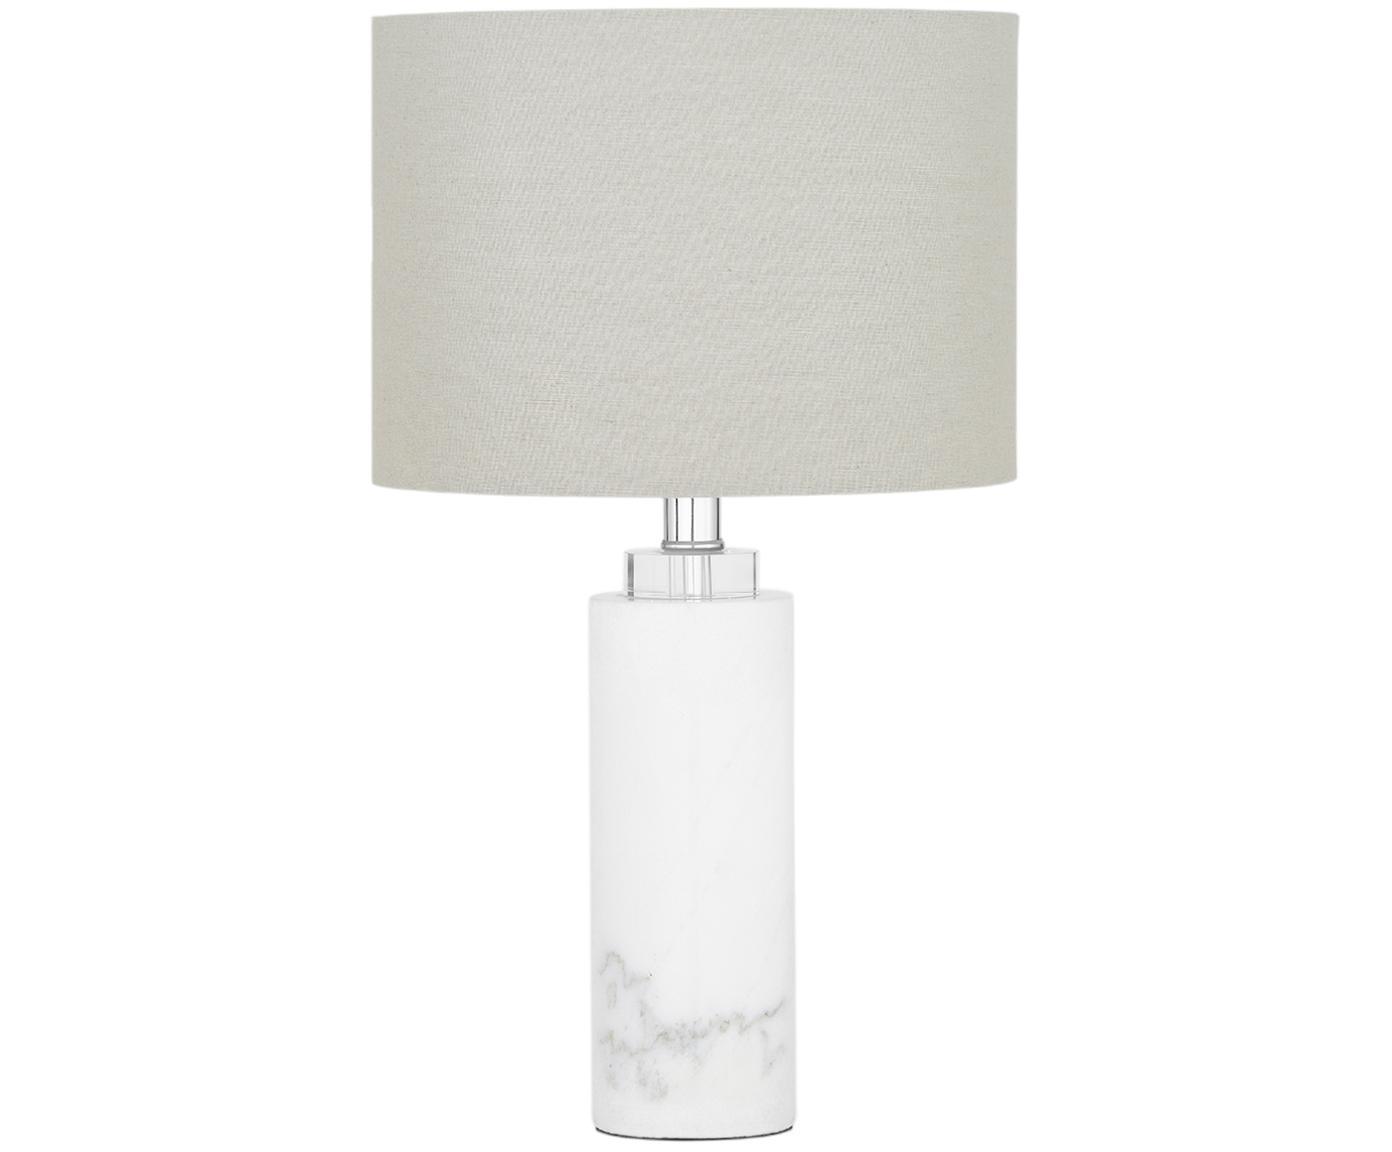 Marmeren tafellamp Amanda, Lampenkap: textiel, Lampvoet: marmer, kristalglas, Wit, Ø 28 x H 48 cm